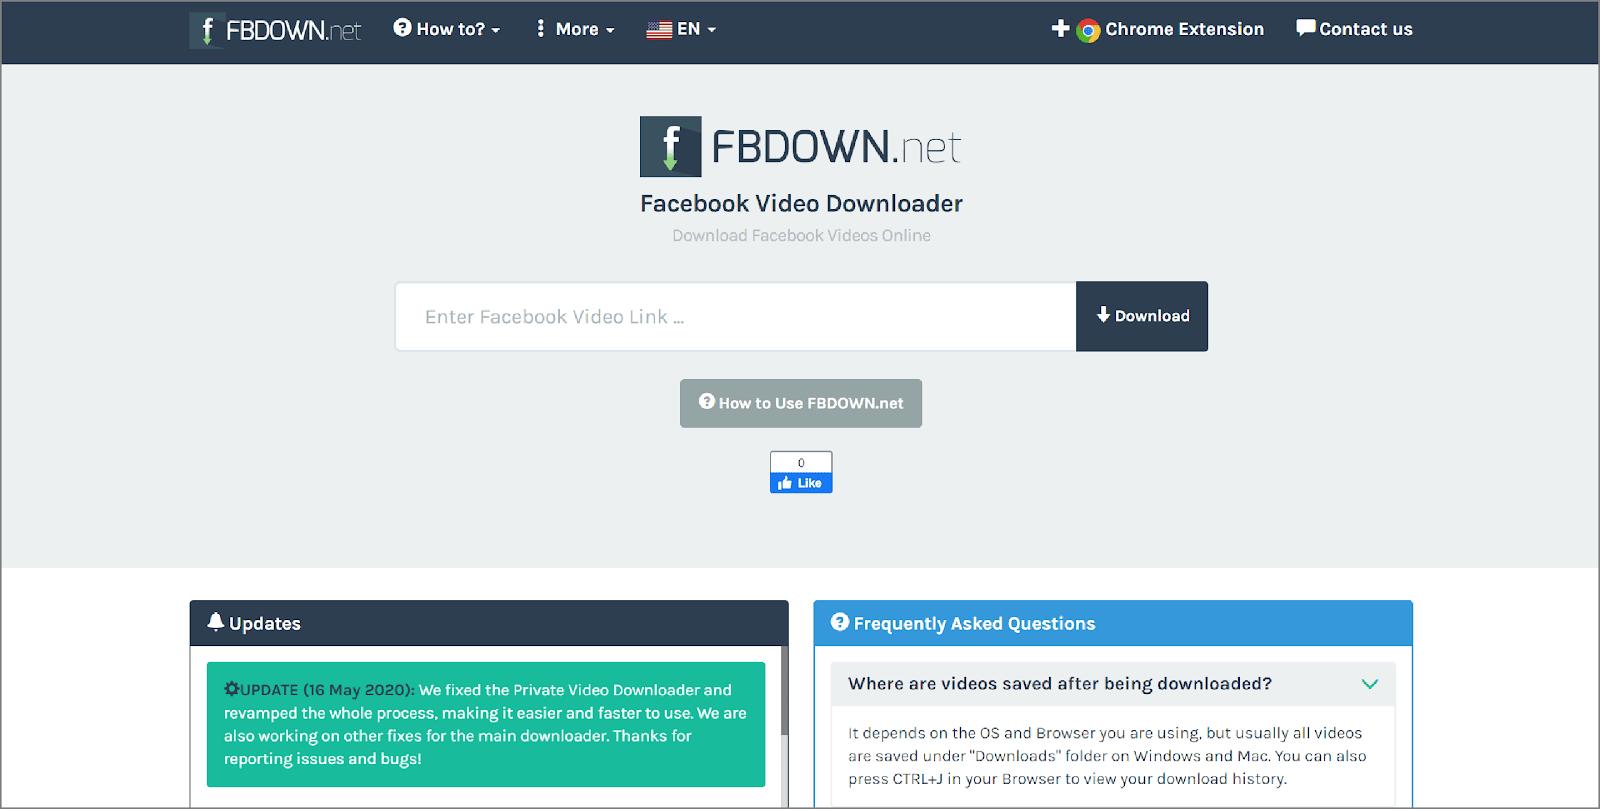 fbdown for Downloading Facebook Videos.